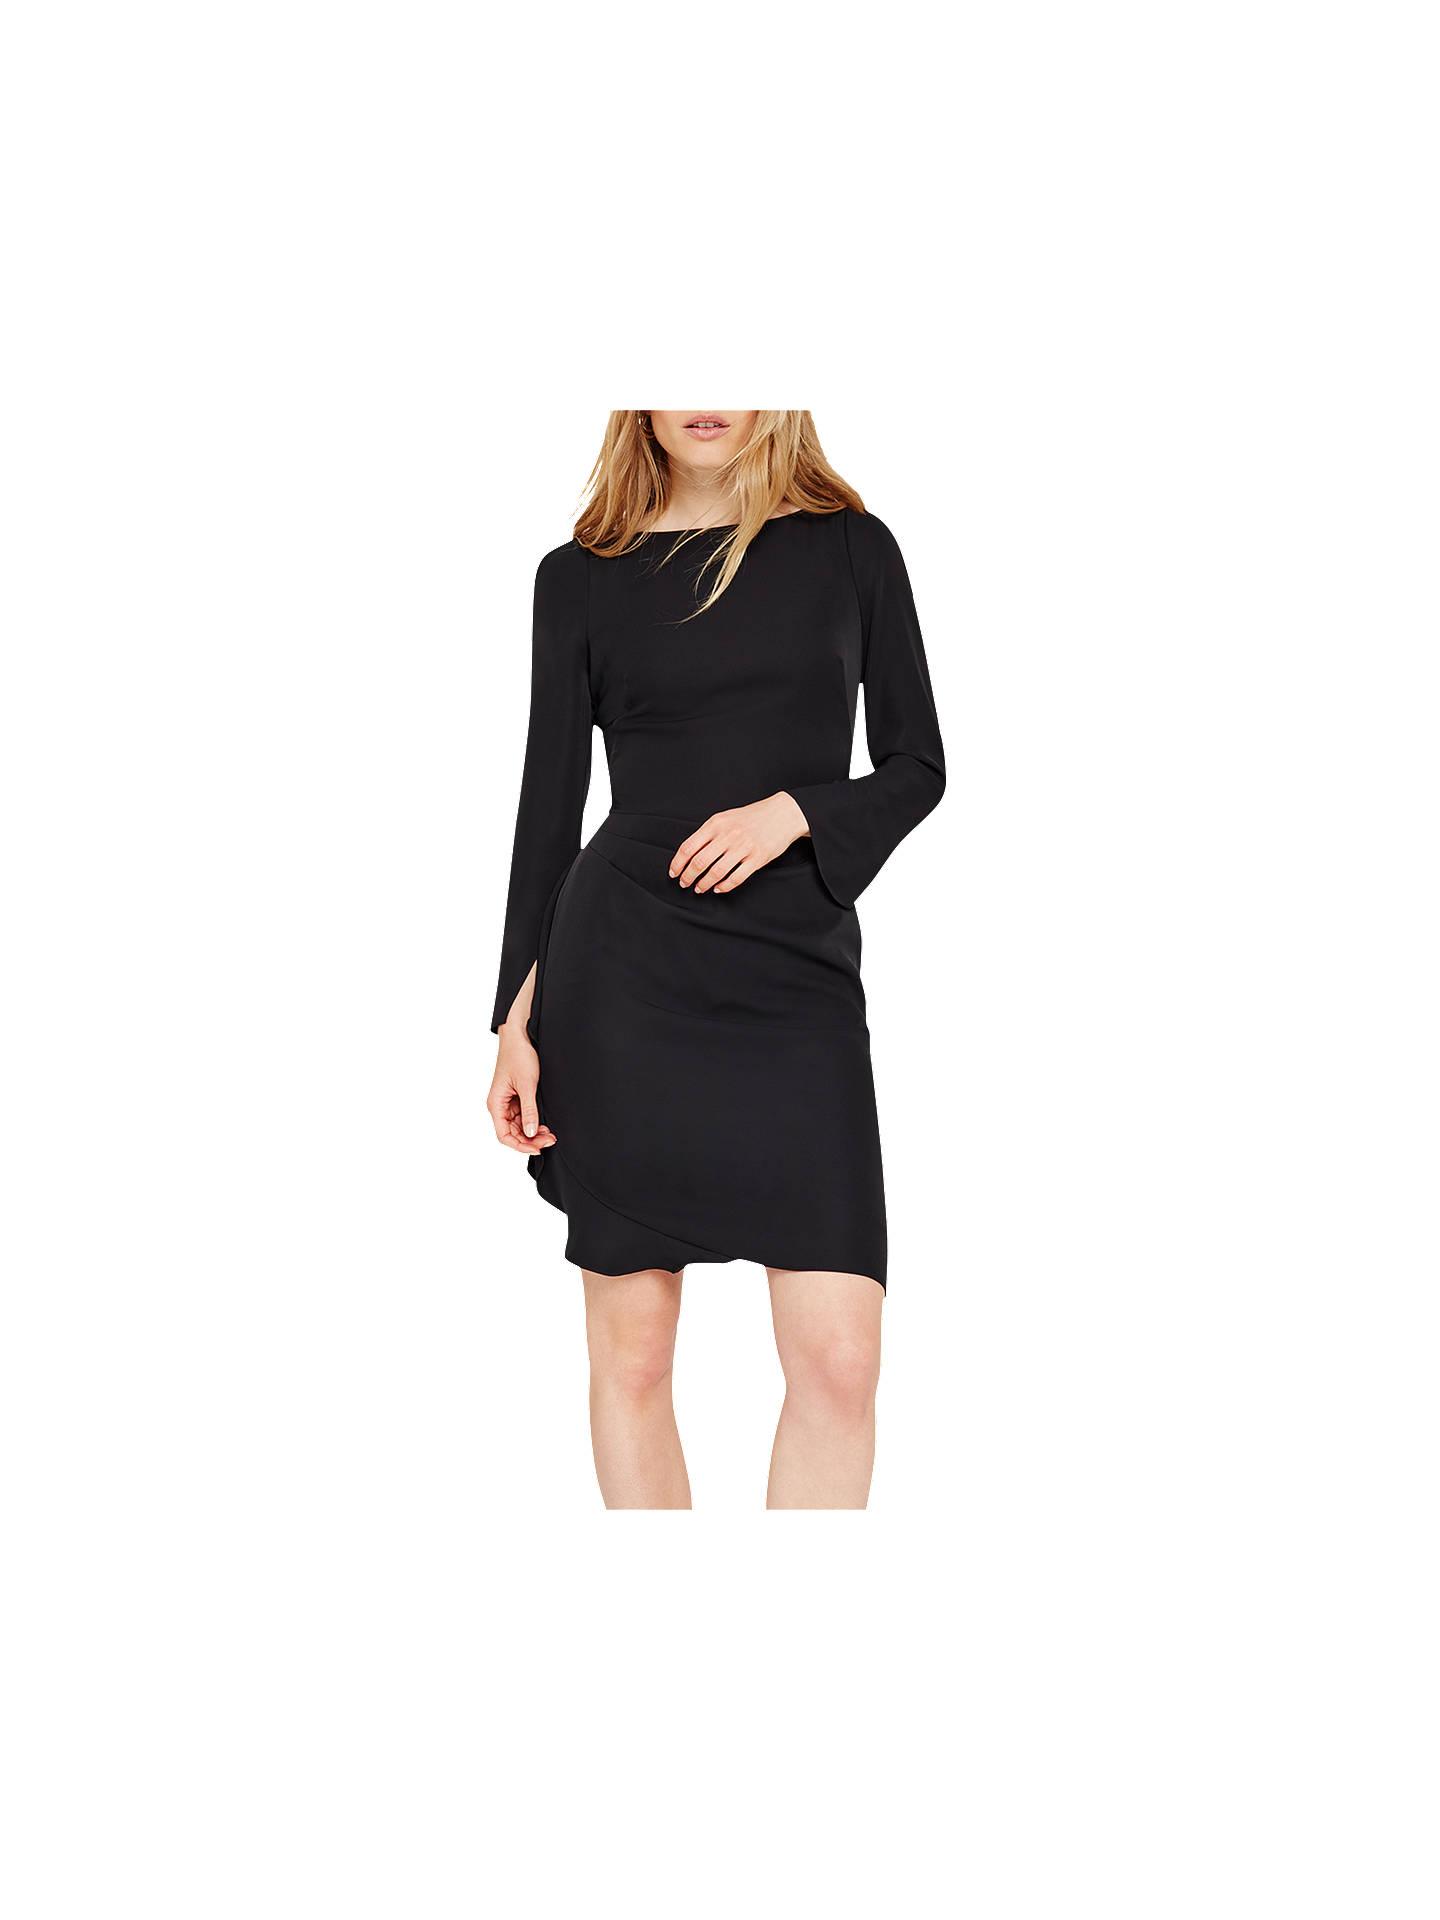 feff4c7b5a7 Buy Damsel in a Dress Carrera Frill Dress, Black, 8 Online at johnlewis.